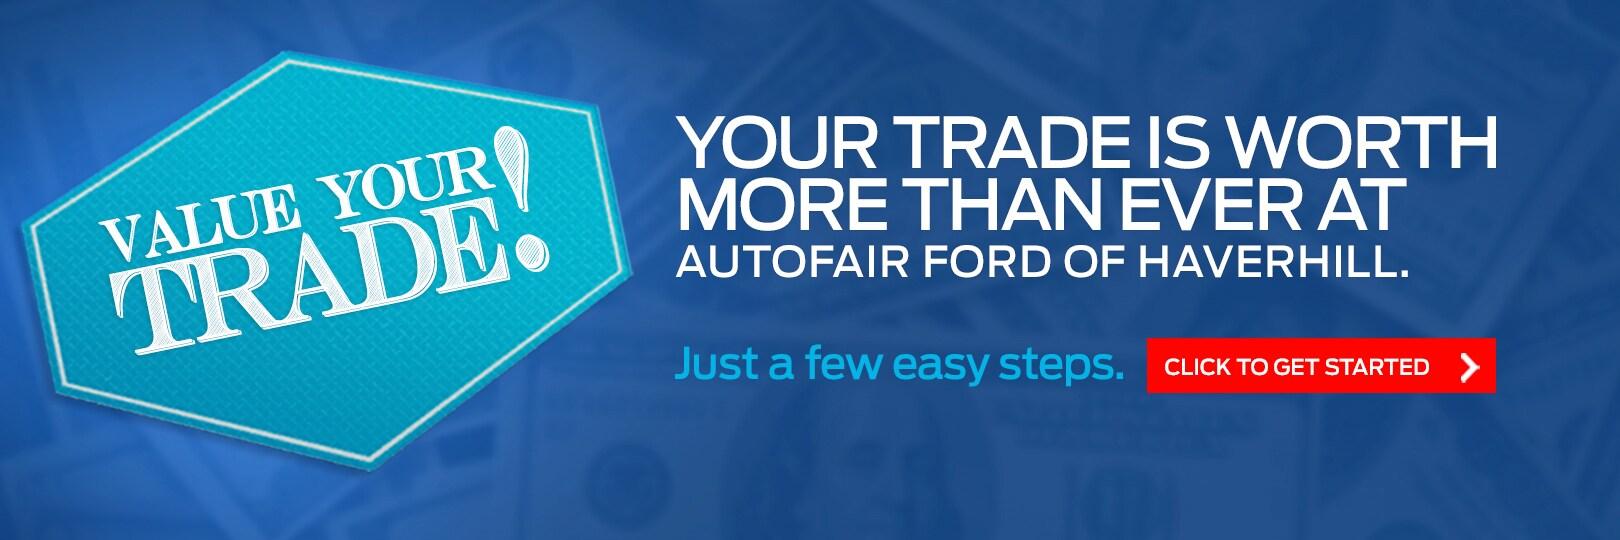 Ford Dealership In Haverhill MA AutoFair Ford Of Haverhill MA - Ford dealers in ma